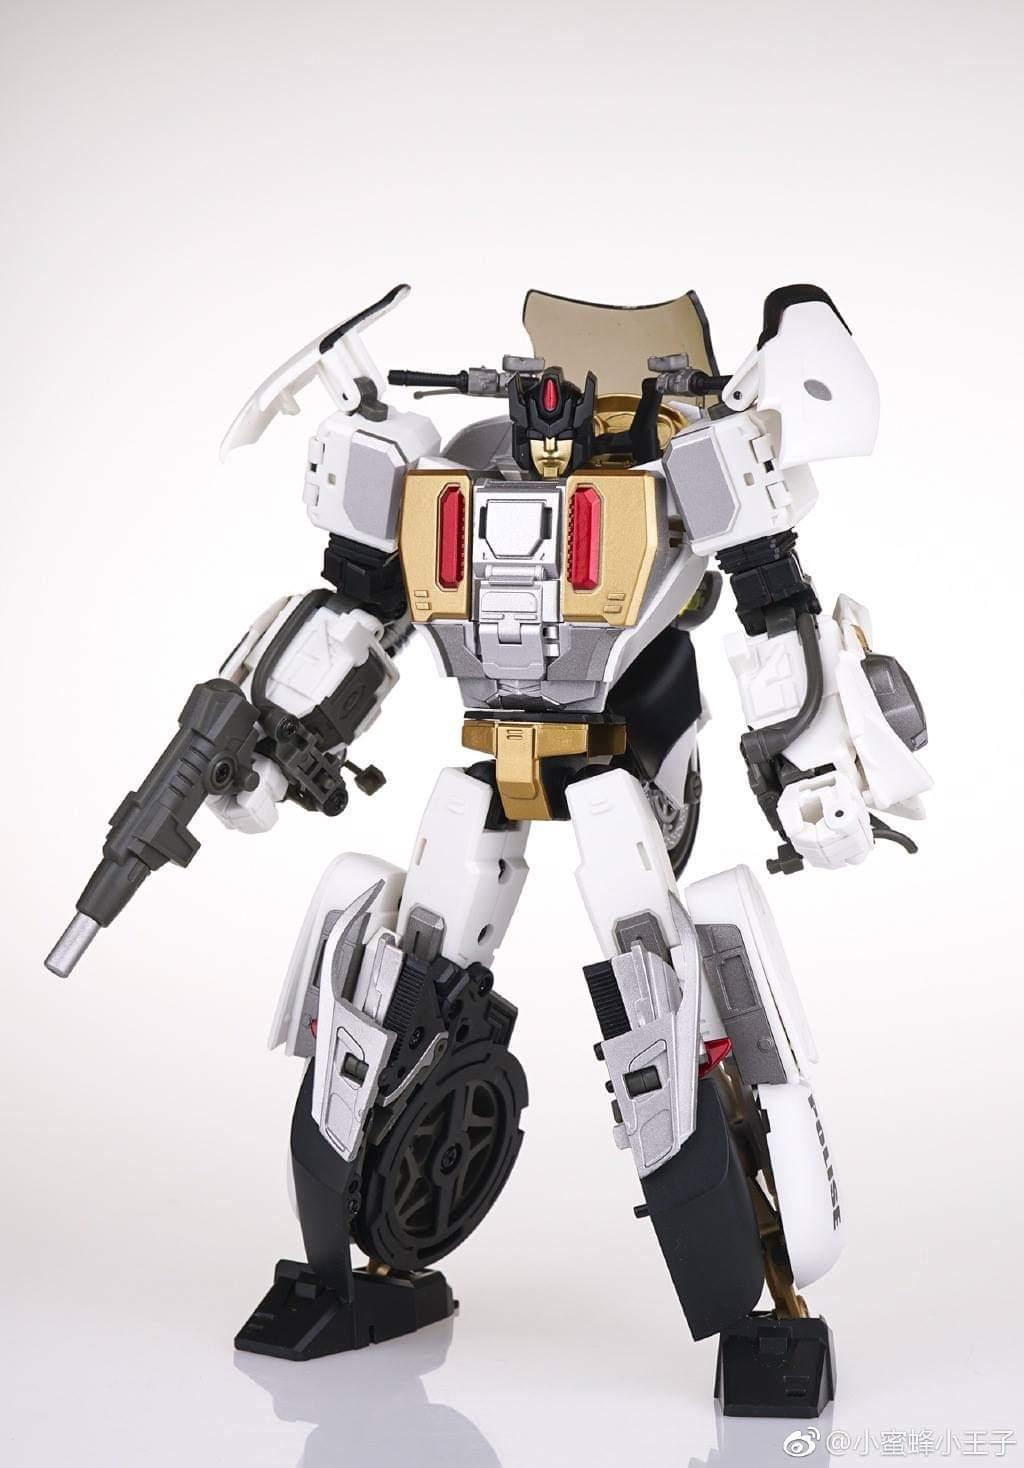 [Generation Toy] Produit Tiers - Jouet GT-08 Guardian - aka Defensor/Defenso - Page 2 WZsD4DKx_o